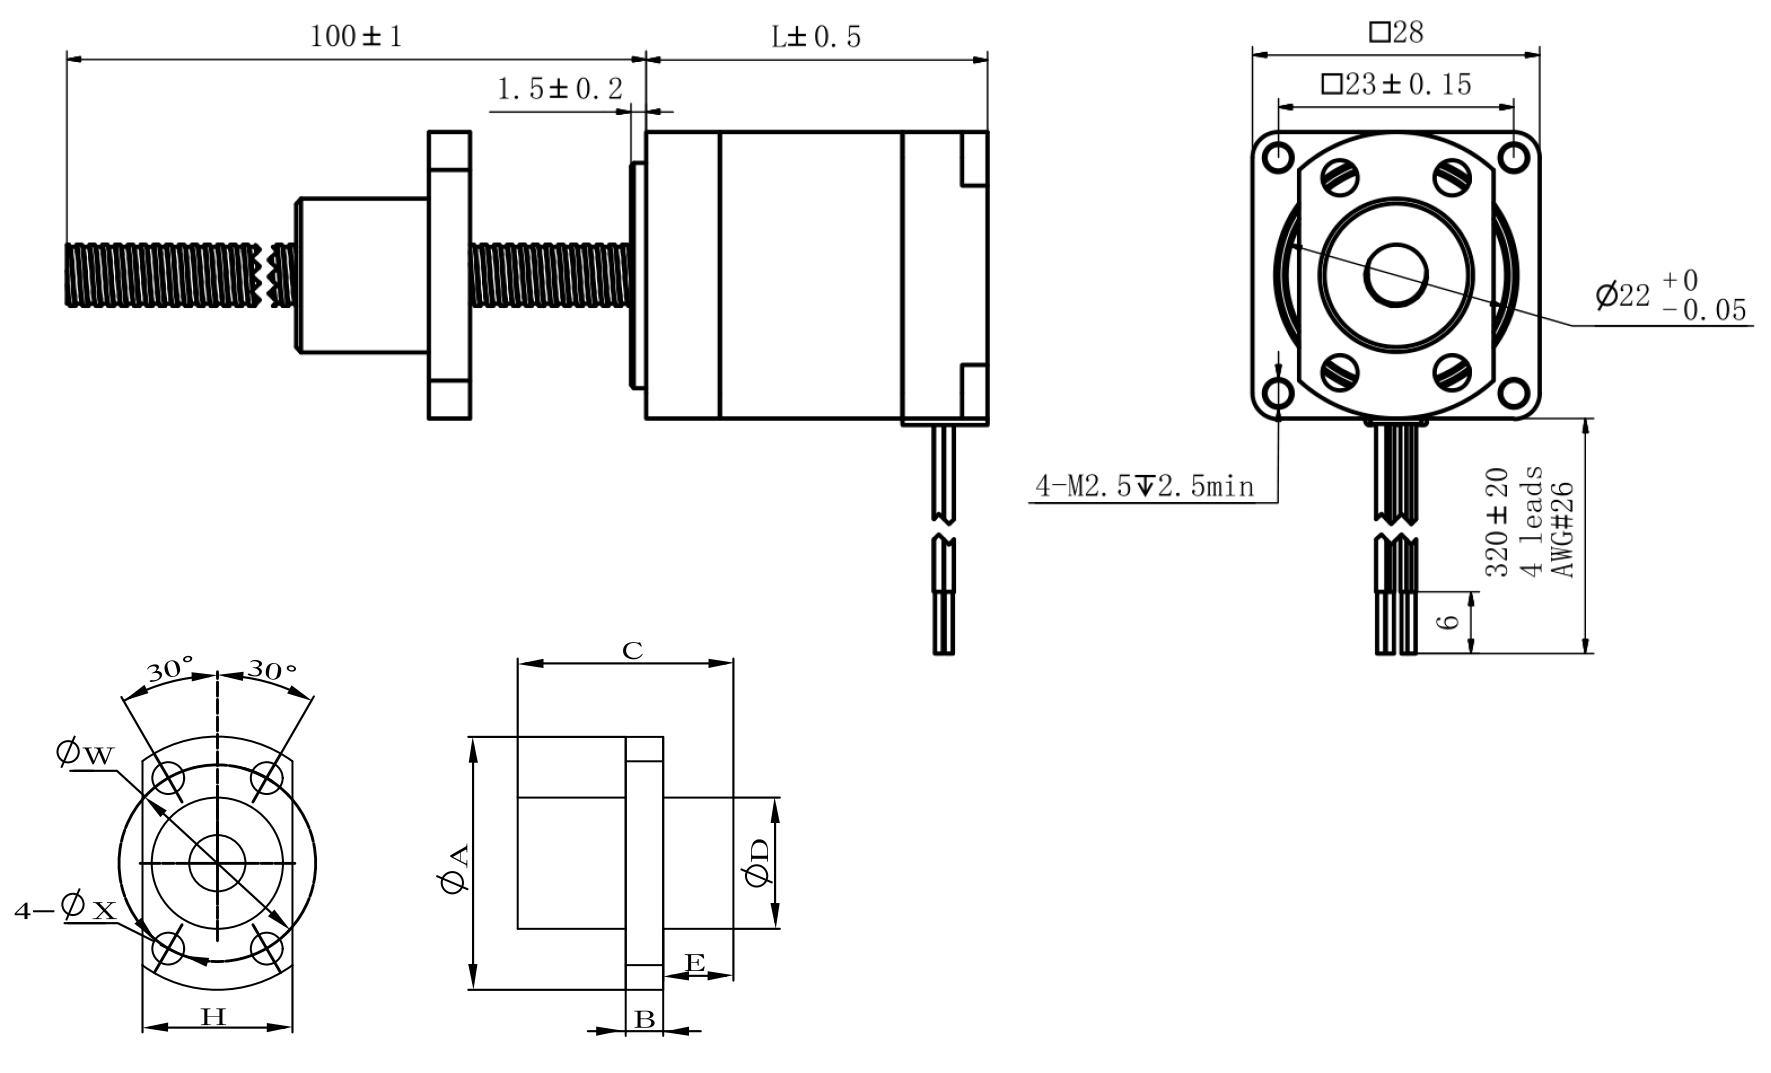 NEMA 11 Ball Screw Actuator Drawing